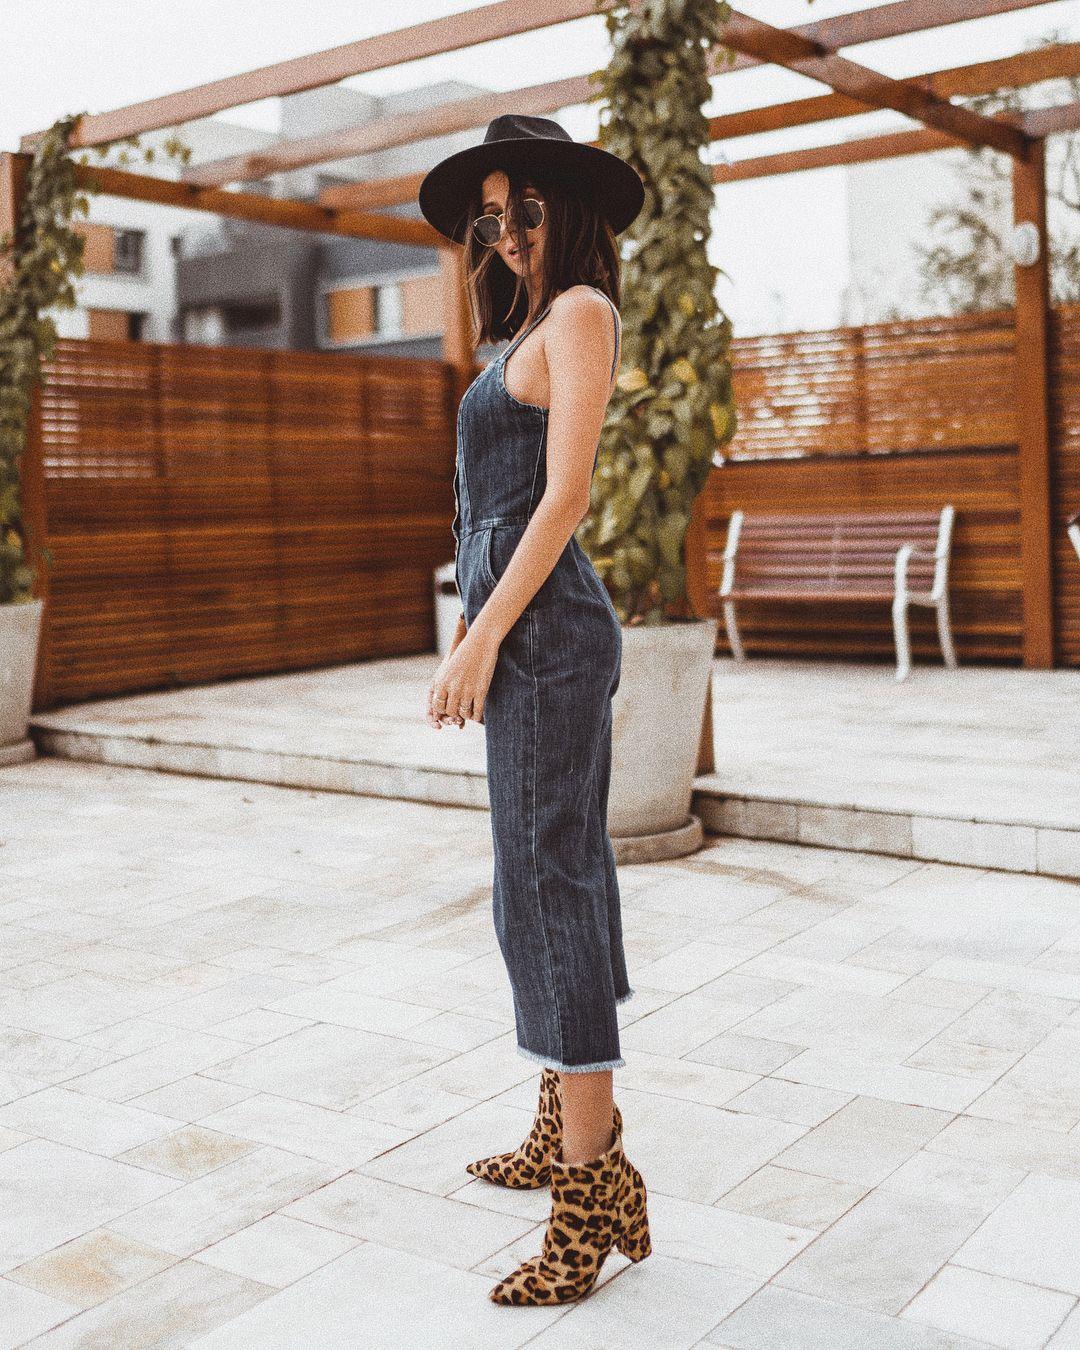 Macacão jeans + botas de onça + chapéu  lookdodia Instagram   viihrocha  Macacos Animais 8bdb8b6f105